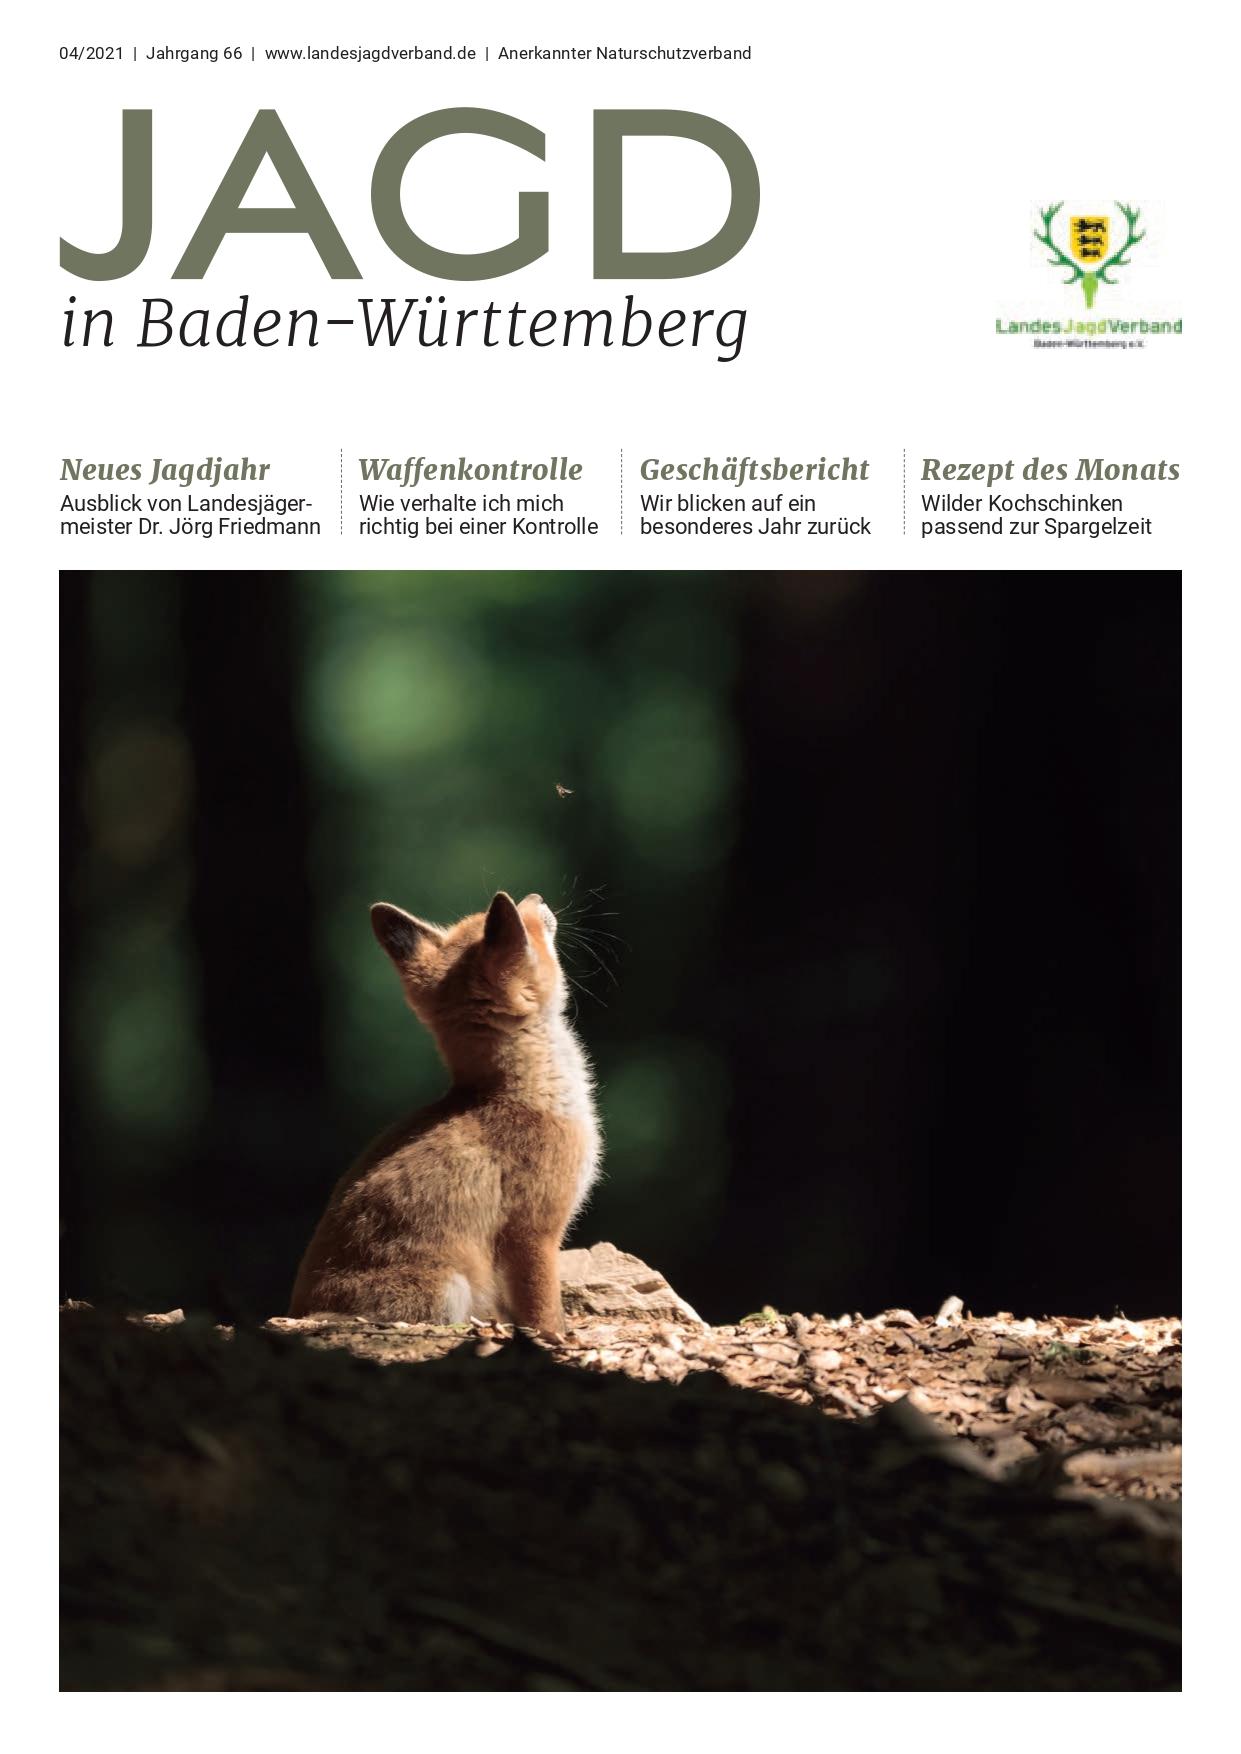 Titelseite der Jagd in Baden-Württemberg Nr. 4/2021